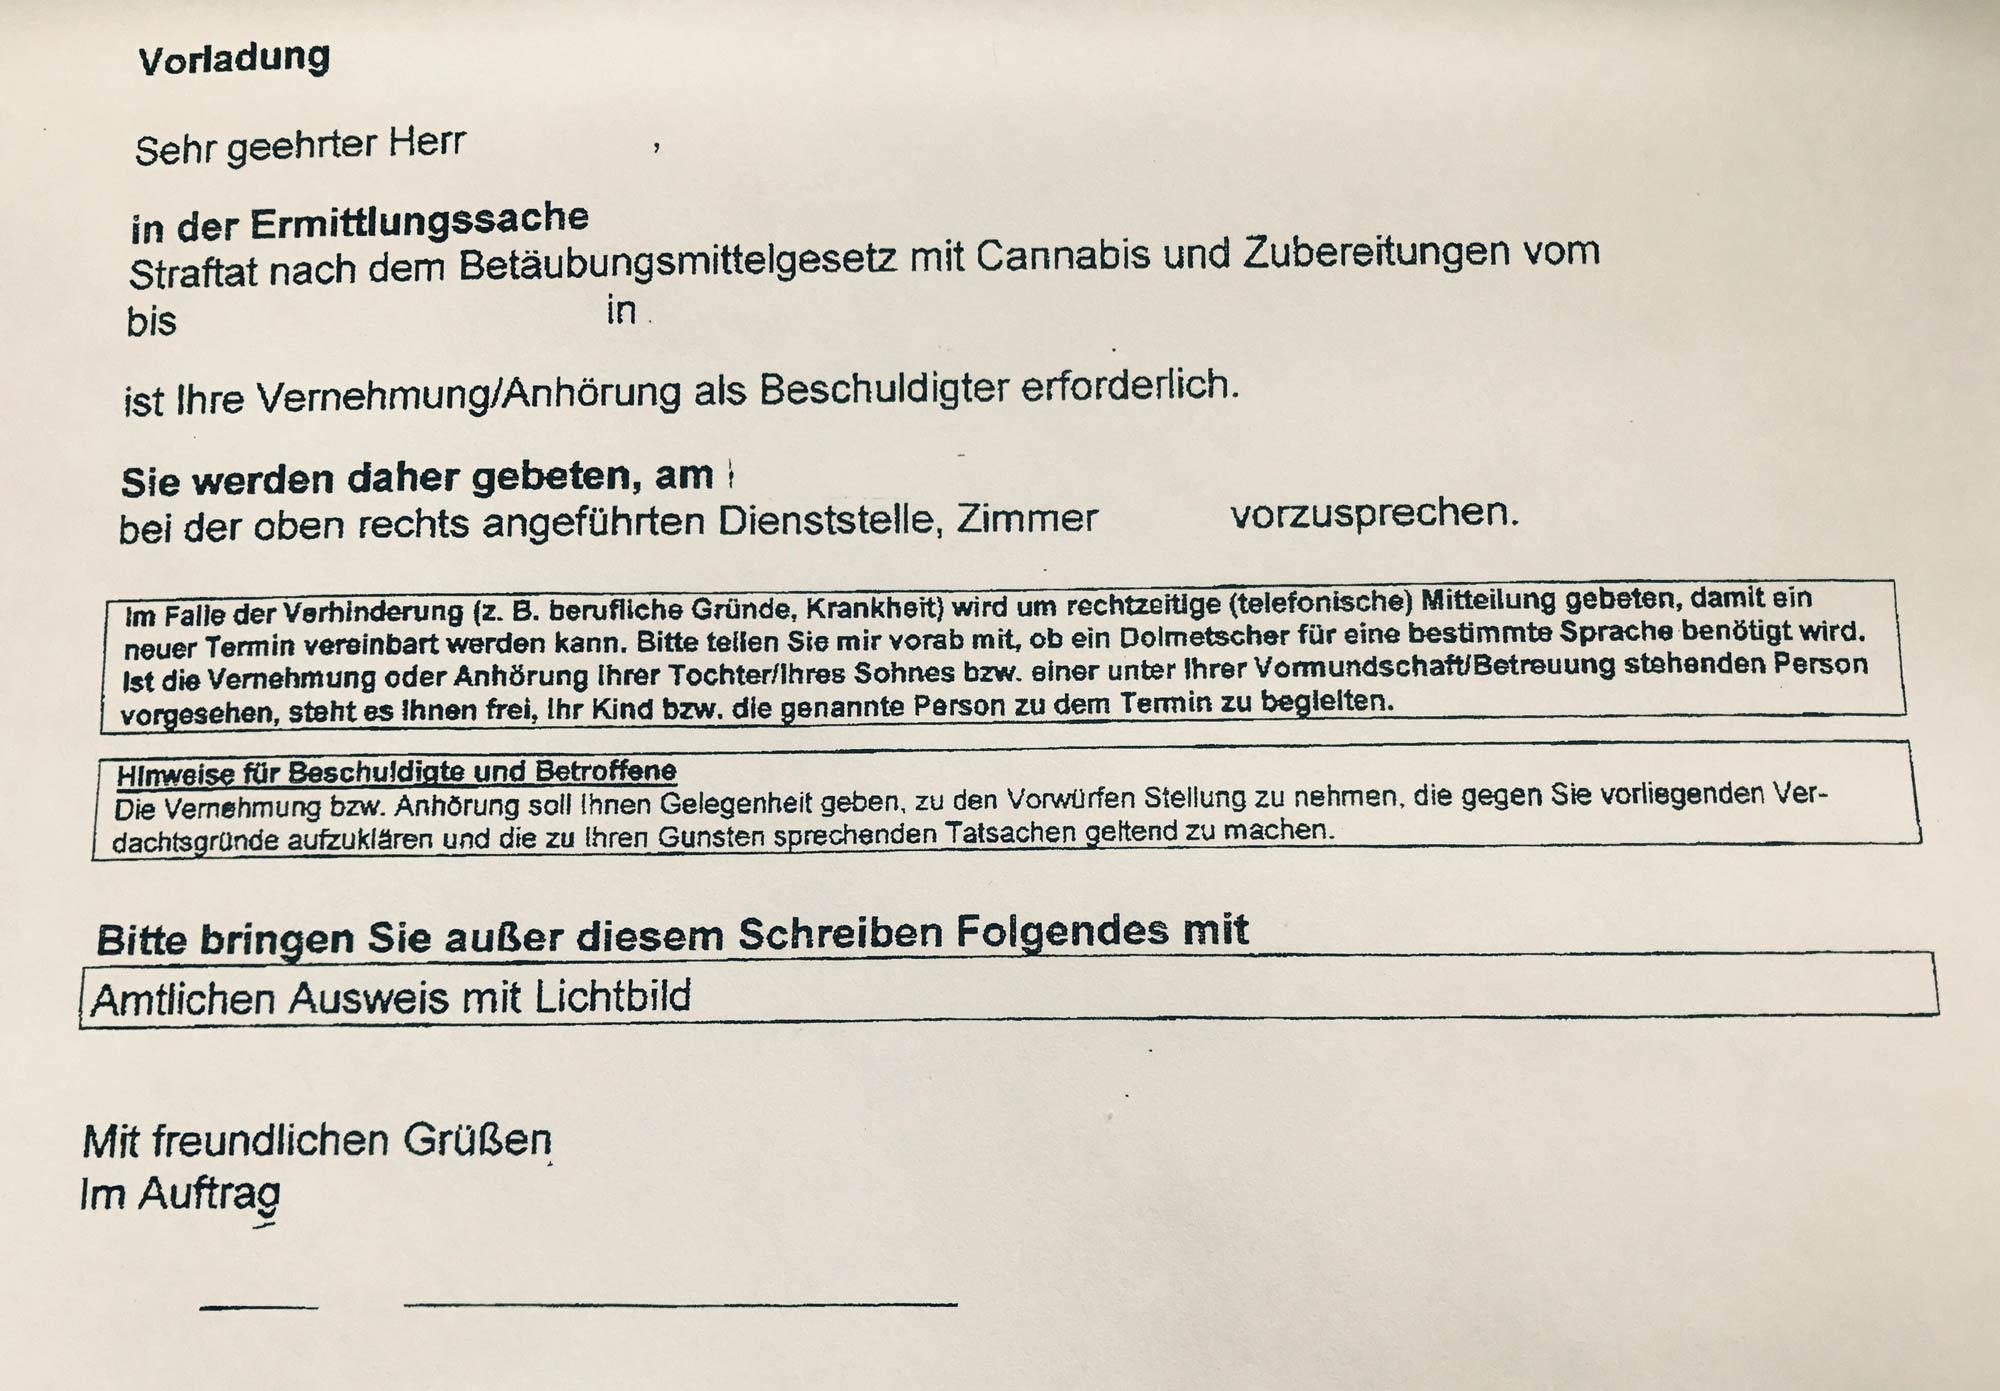 Kanzlei Louis & Michaelis Rechtsanwälte und Strafverteidiger Betäubungsmittelstrafrecht